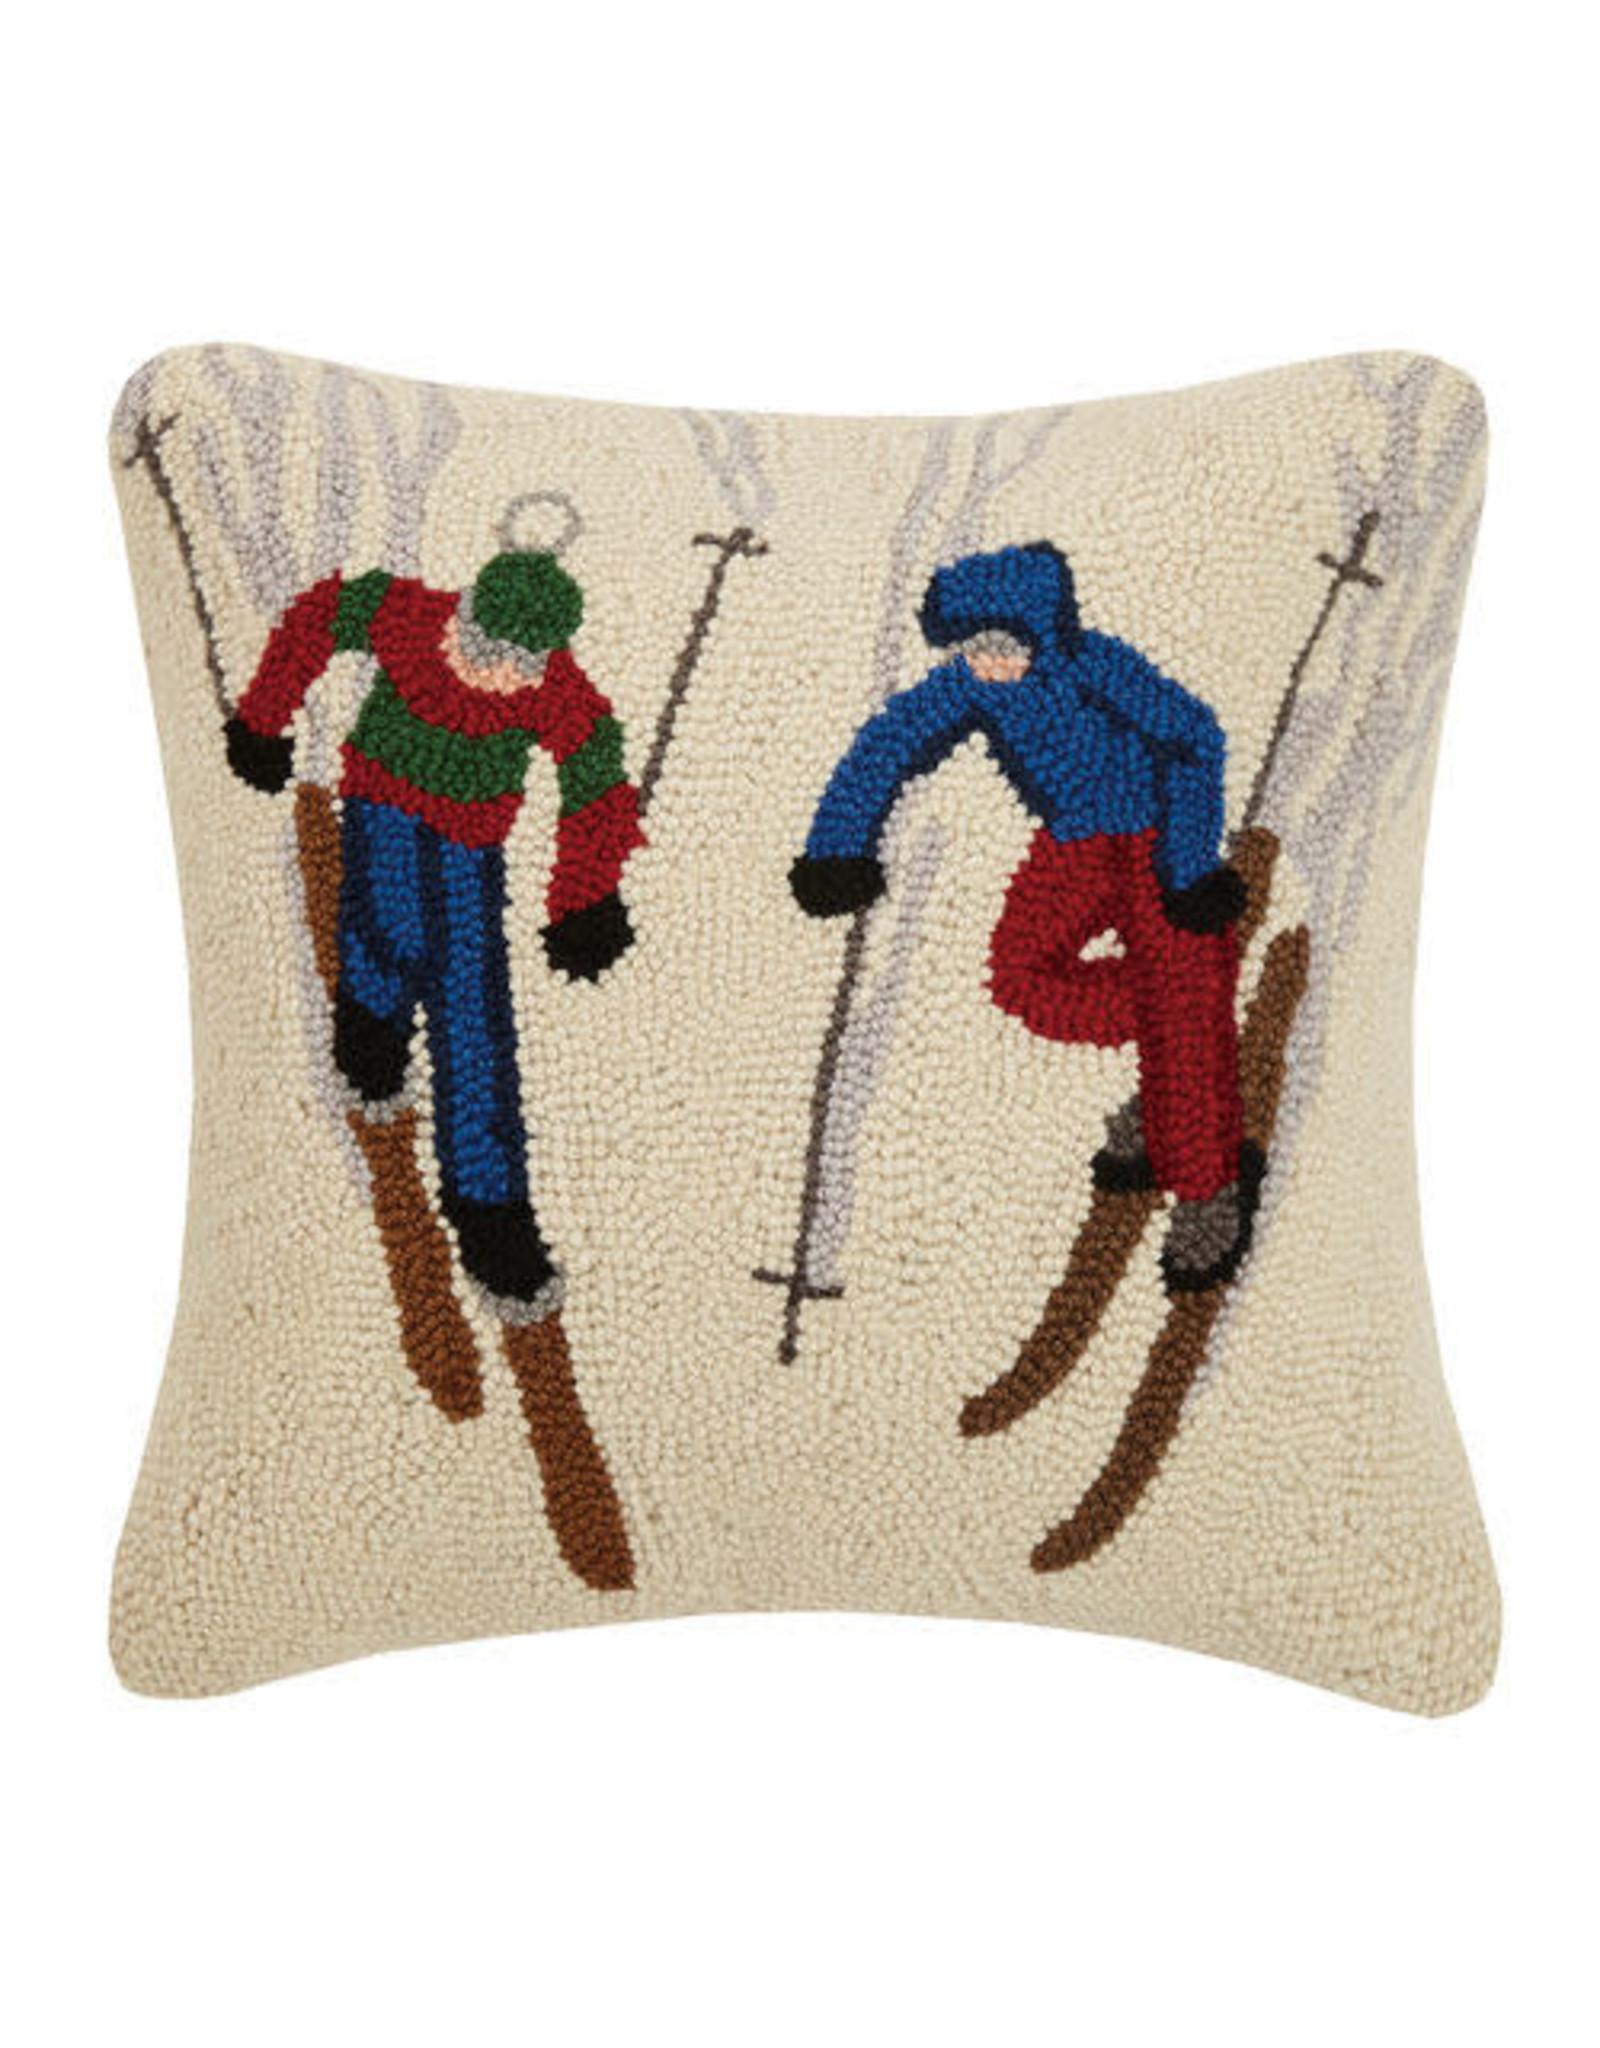 Ski Buddies Pillow